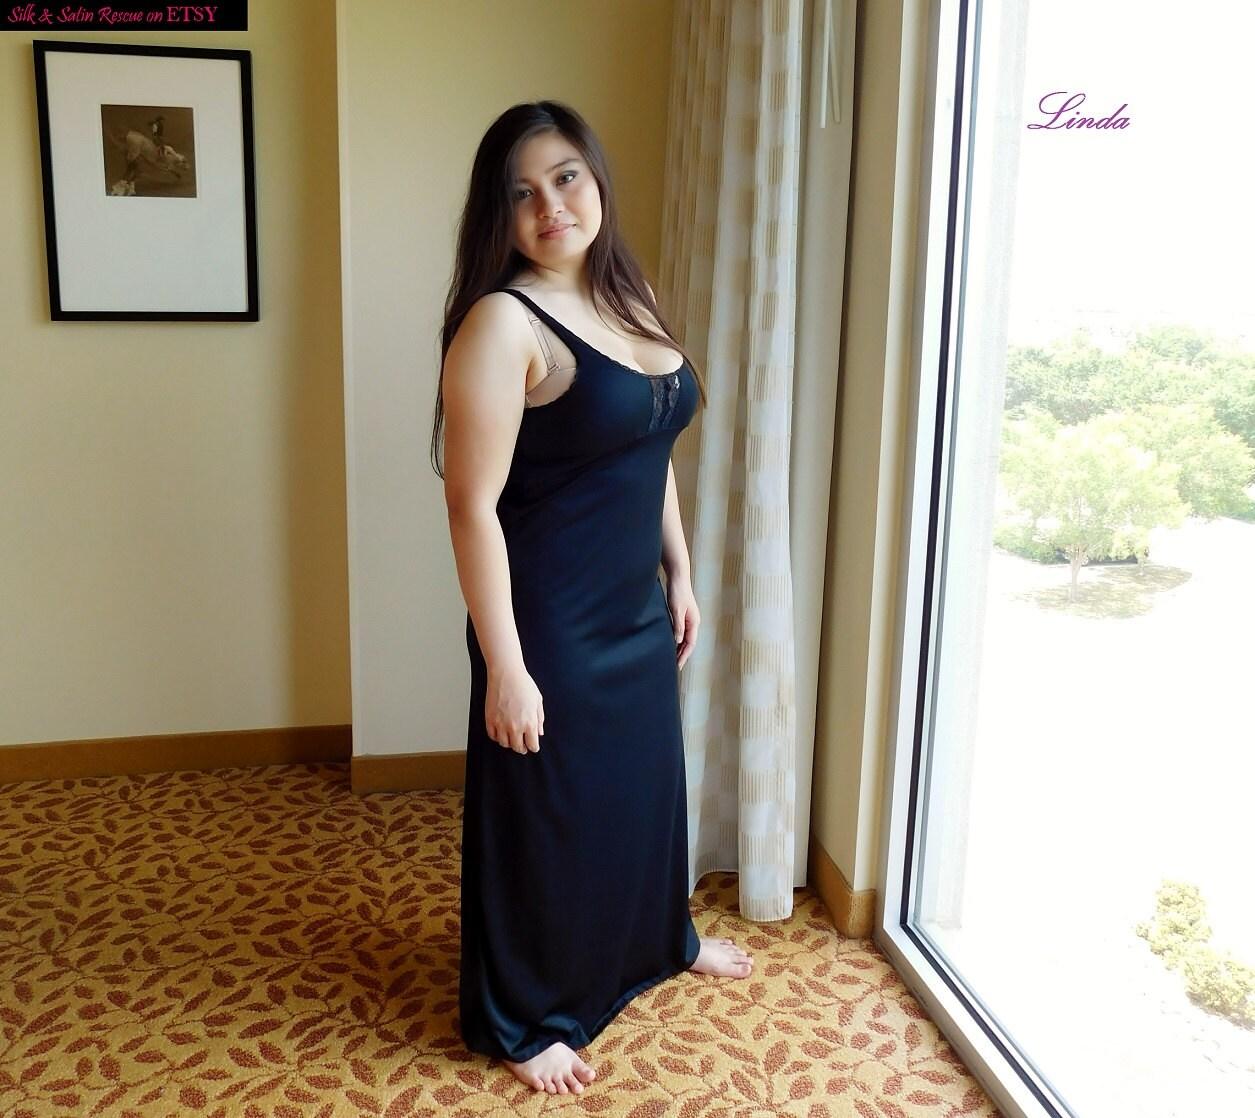 black nylon and lace long nightgown negligee nightdress